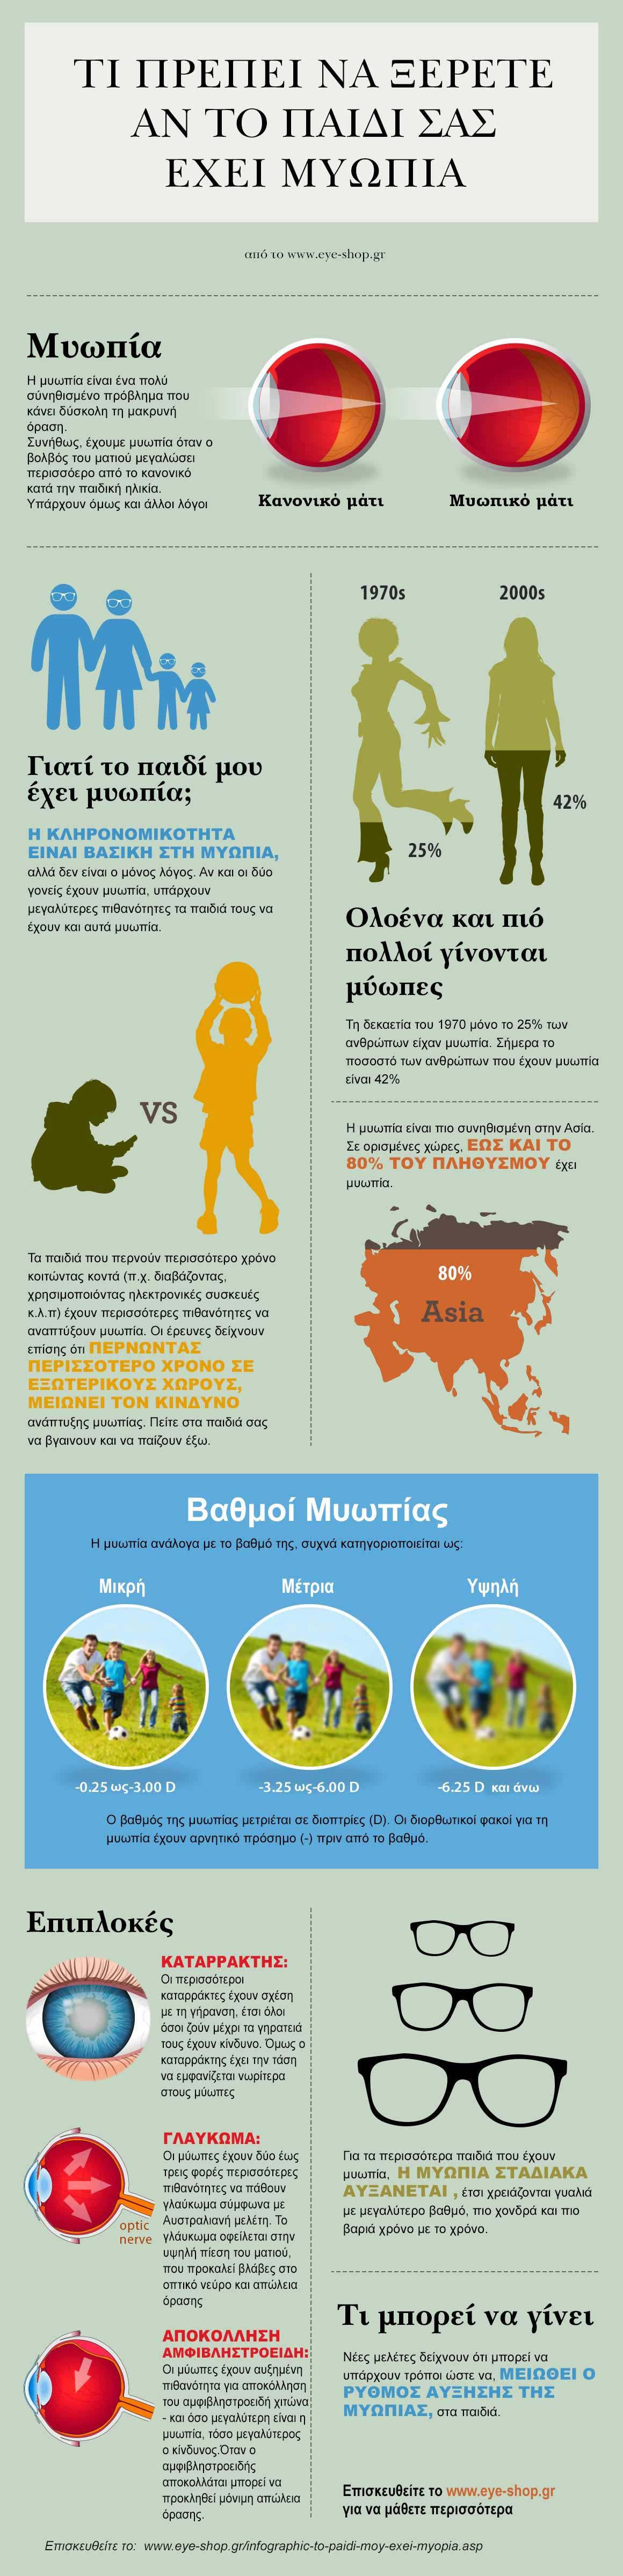 Infographic: Τι πρέπει να ξέρετε εάν το παιδί σας έχει μυωπία